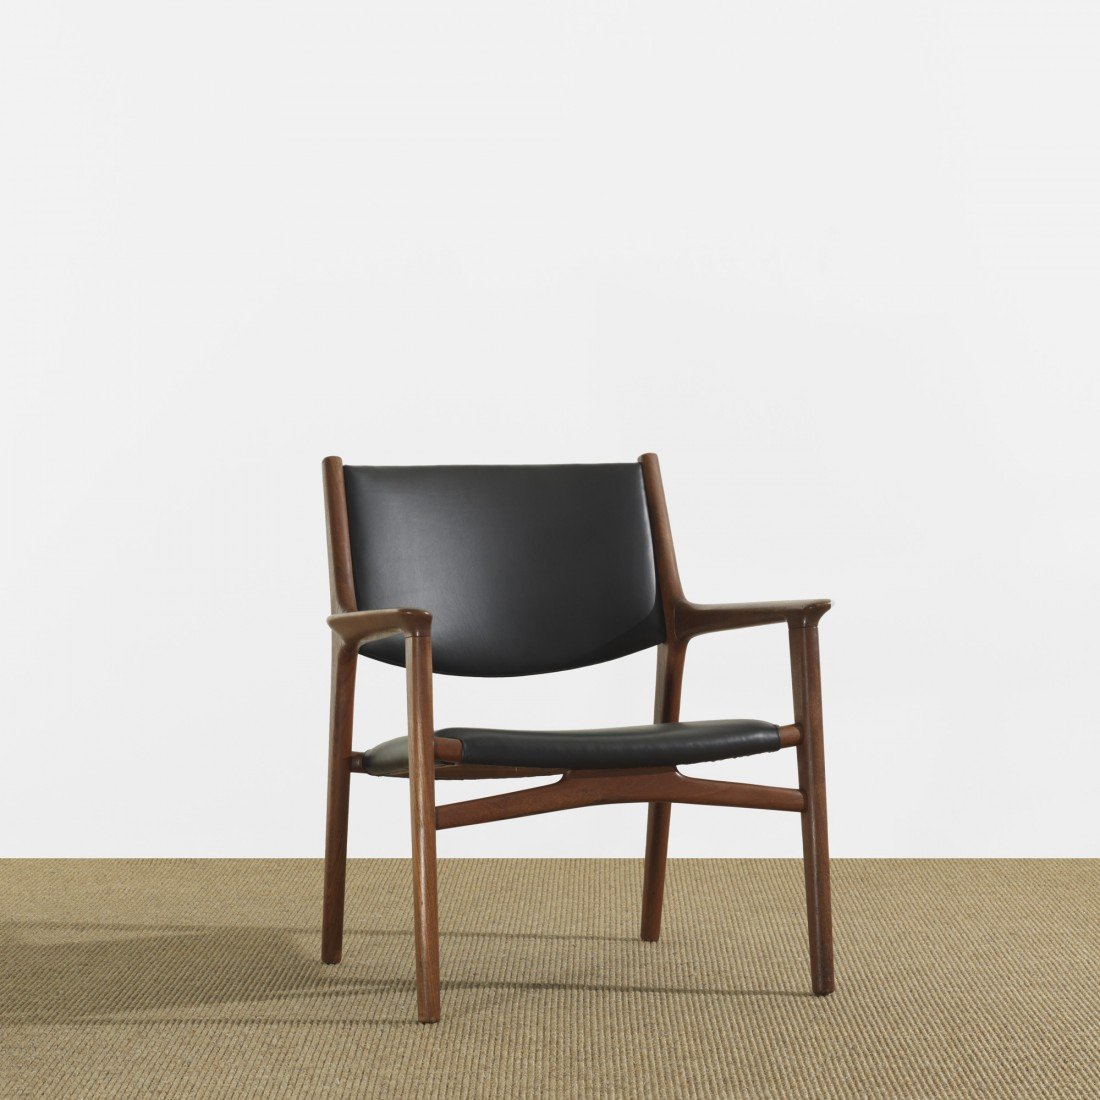 136: Hans Wegner lounge chair